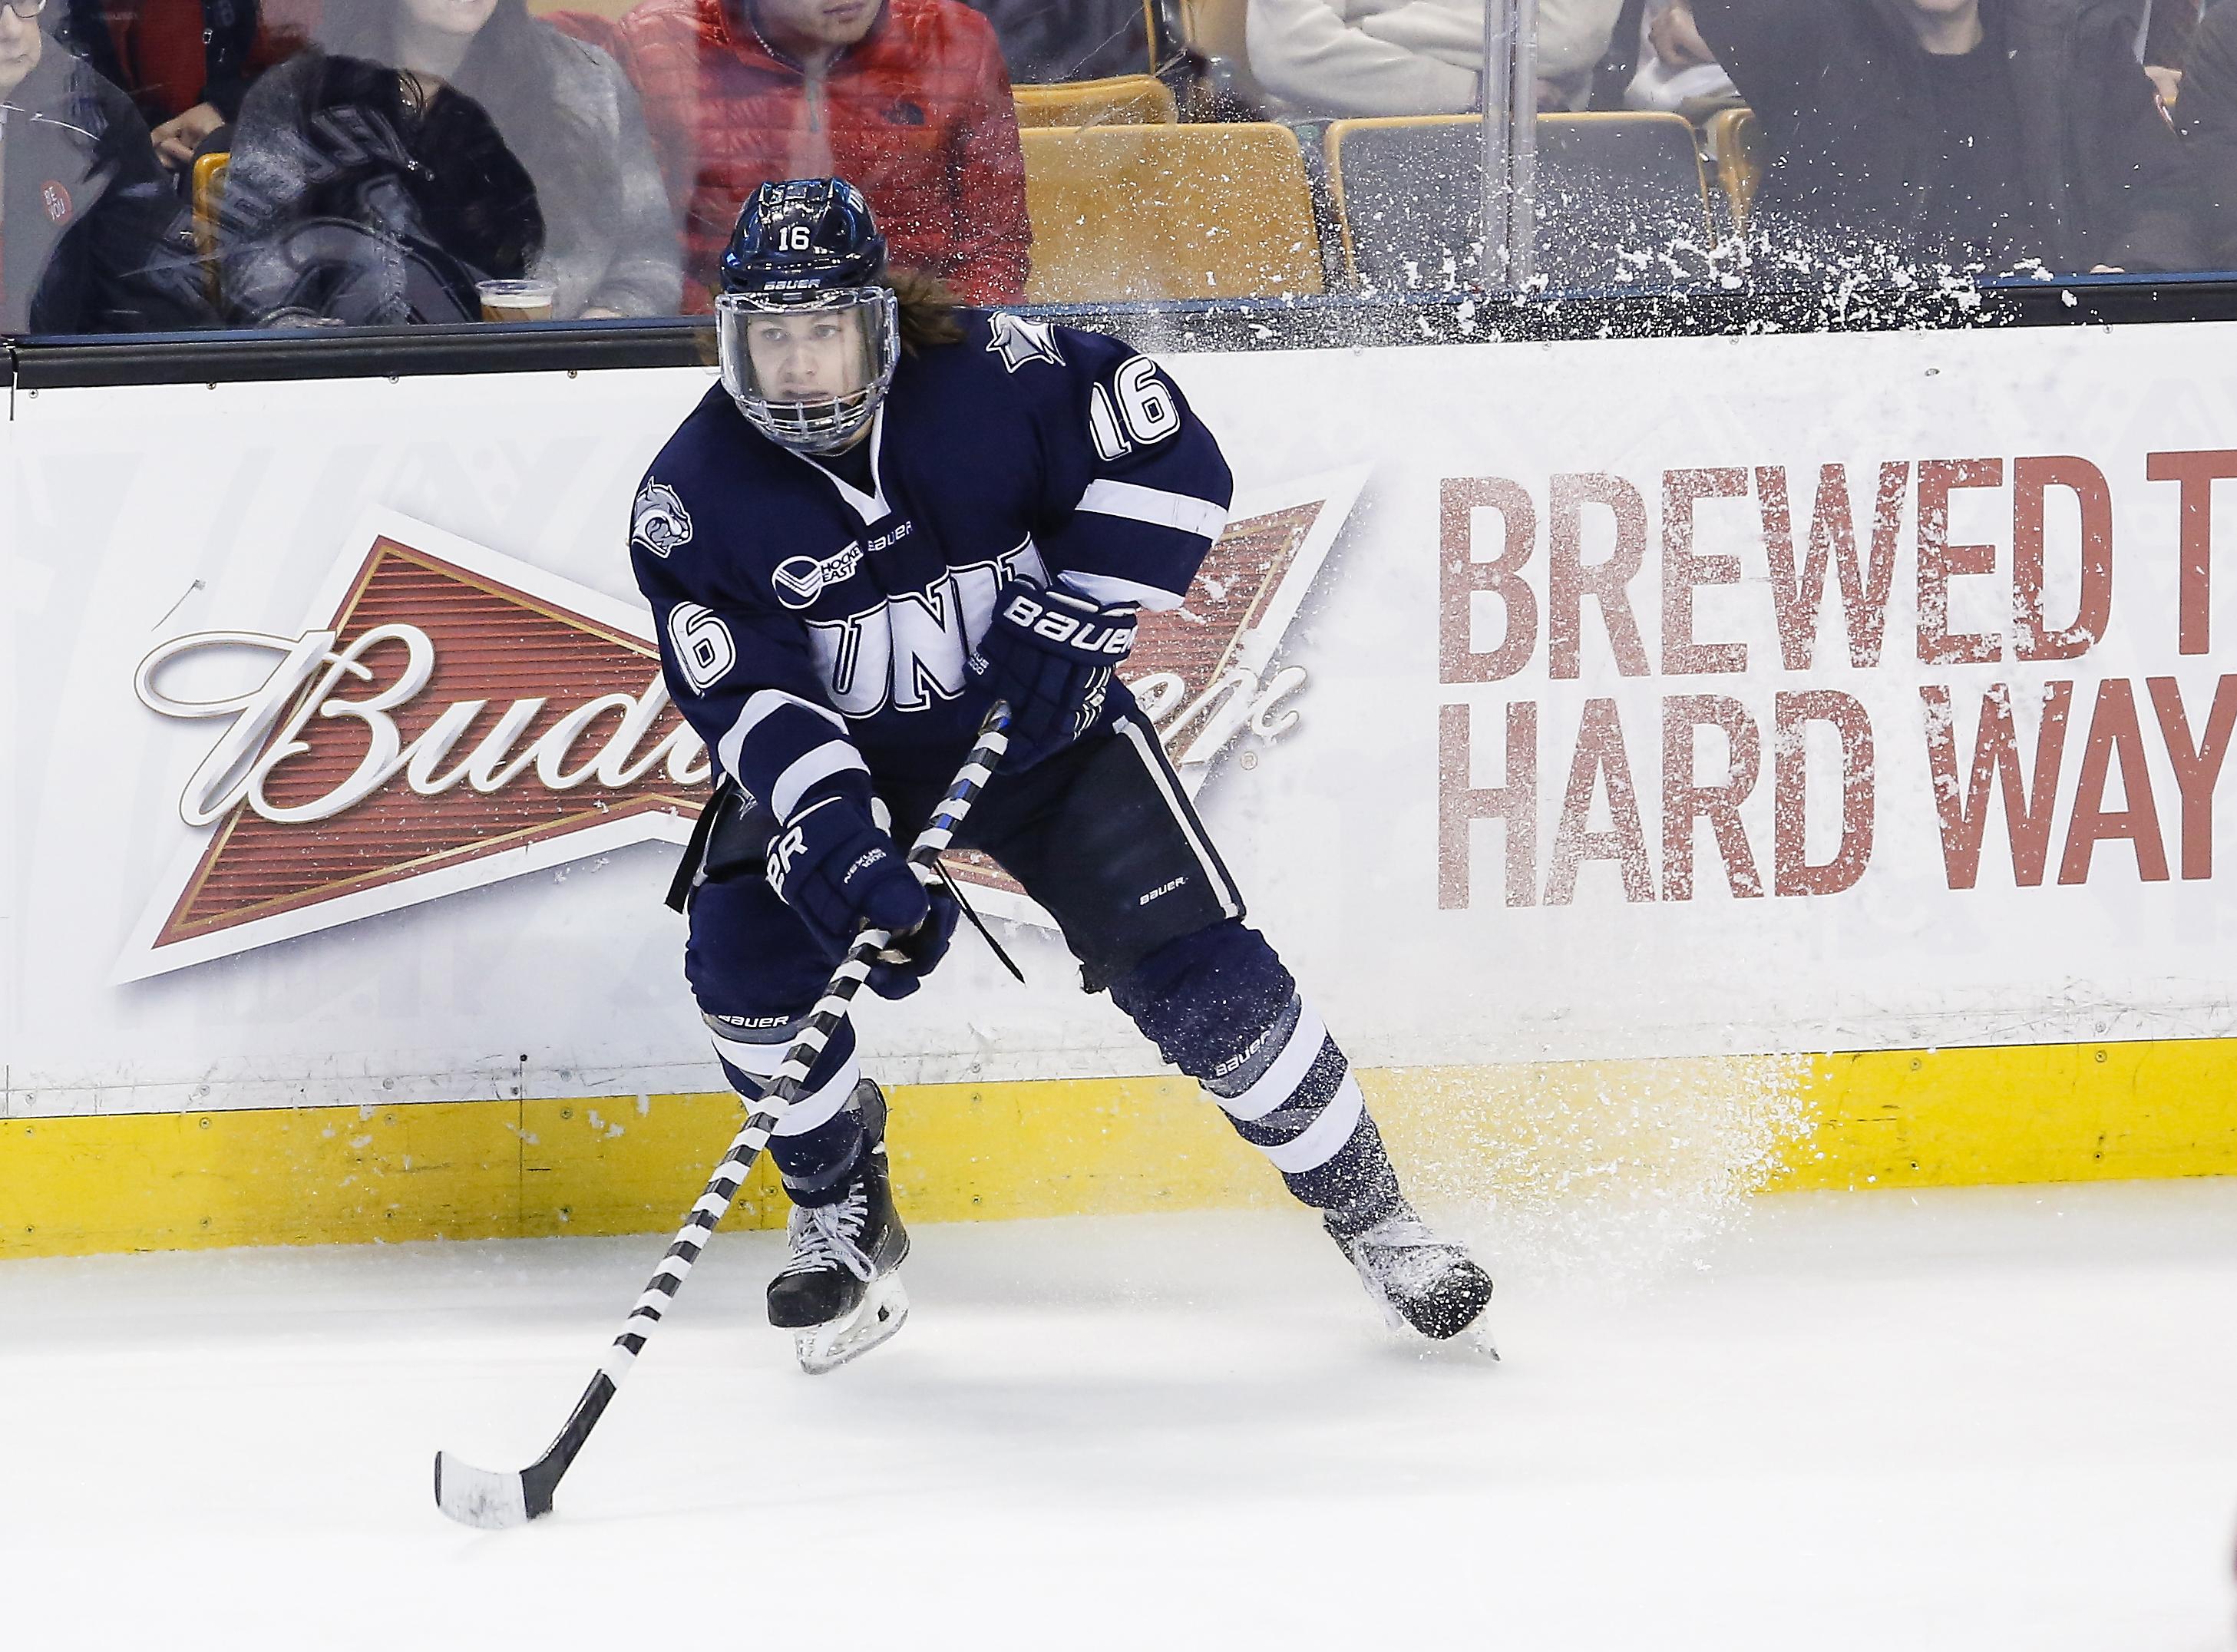 Hockey East: Hockey Sense Sparks Offense For UNH's Kelleher